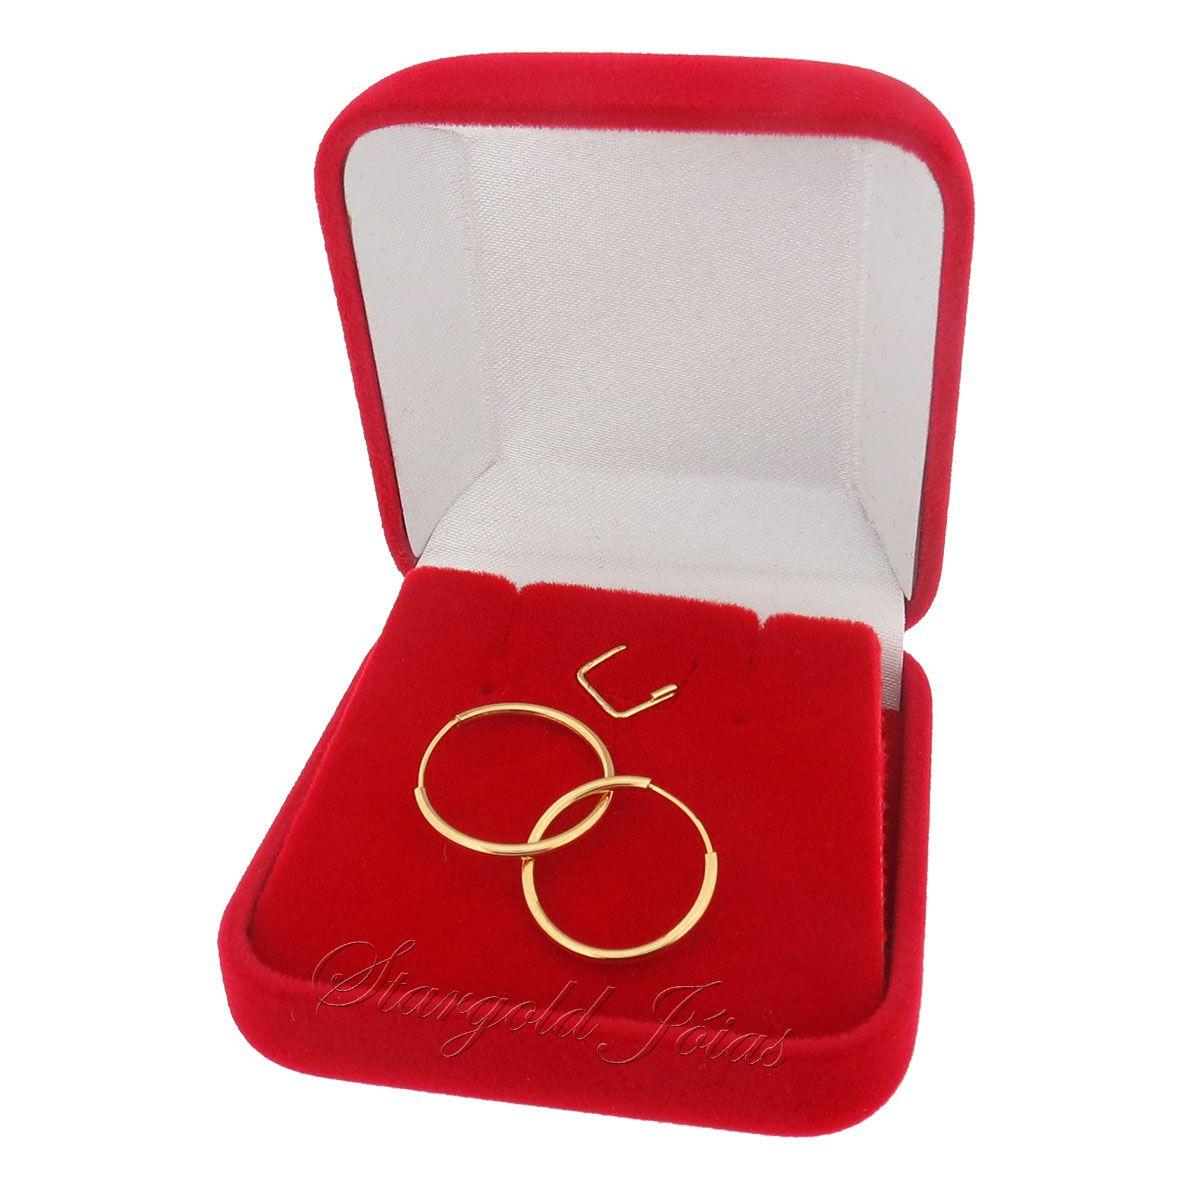 Brinco Argola Redonda 1,8cm Ouro 18k